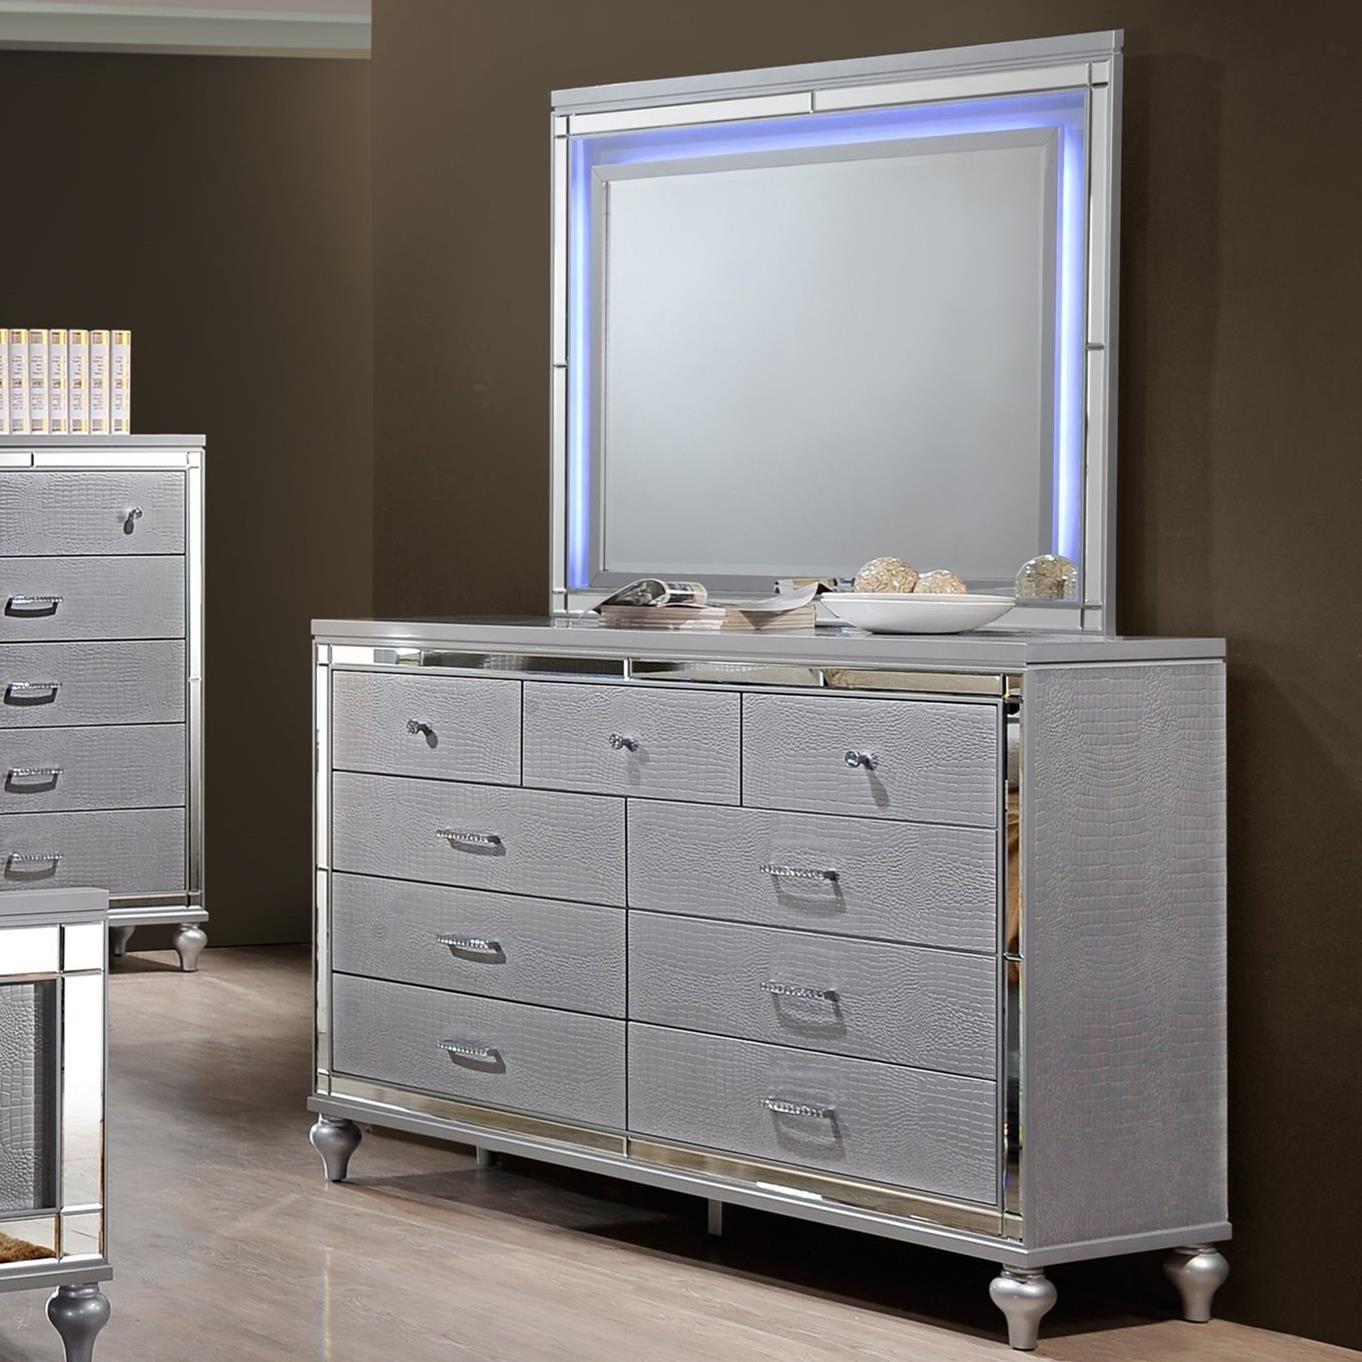 New Classic Valentino Nine Drawer Dresser And Led Backlit Mirror Sam Levitz Furniture Dresser Mirror Sets